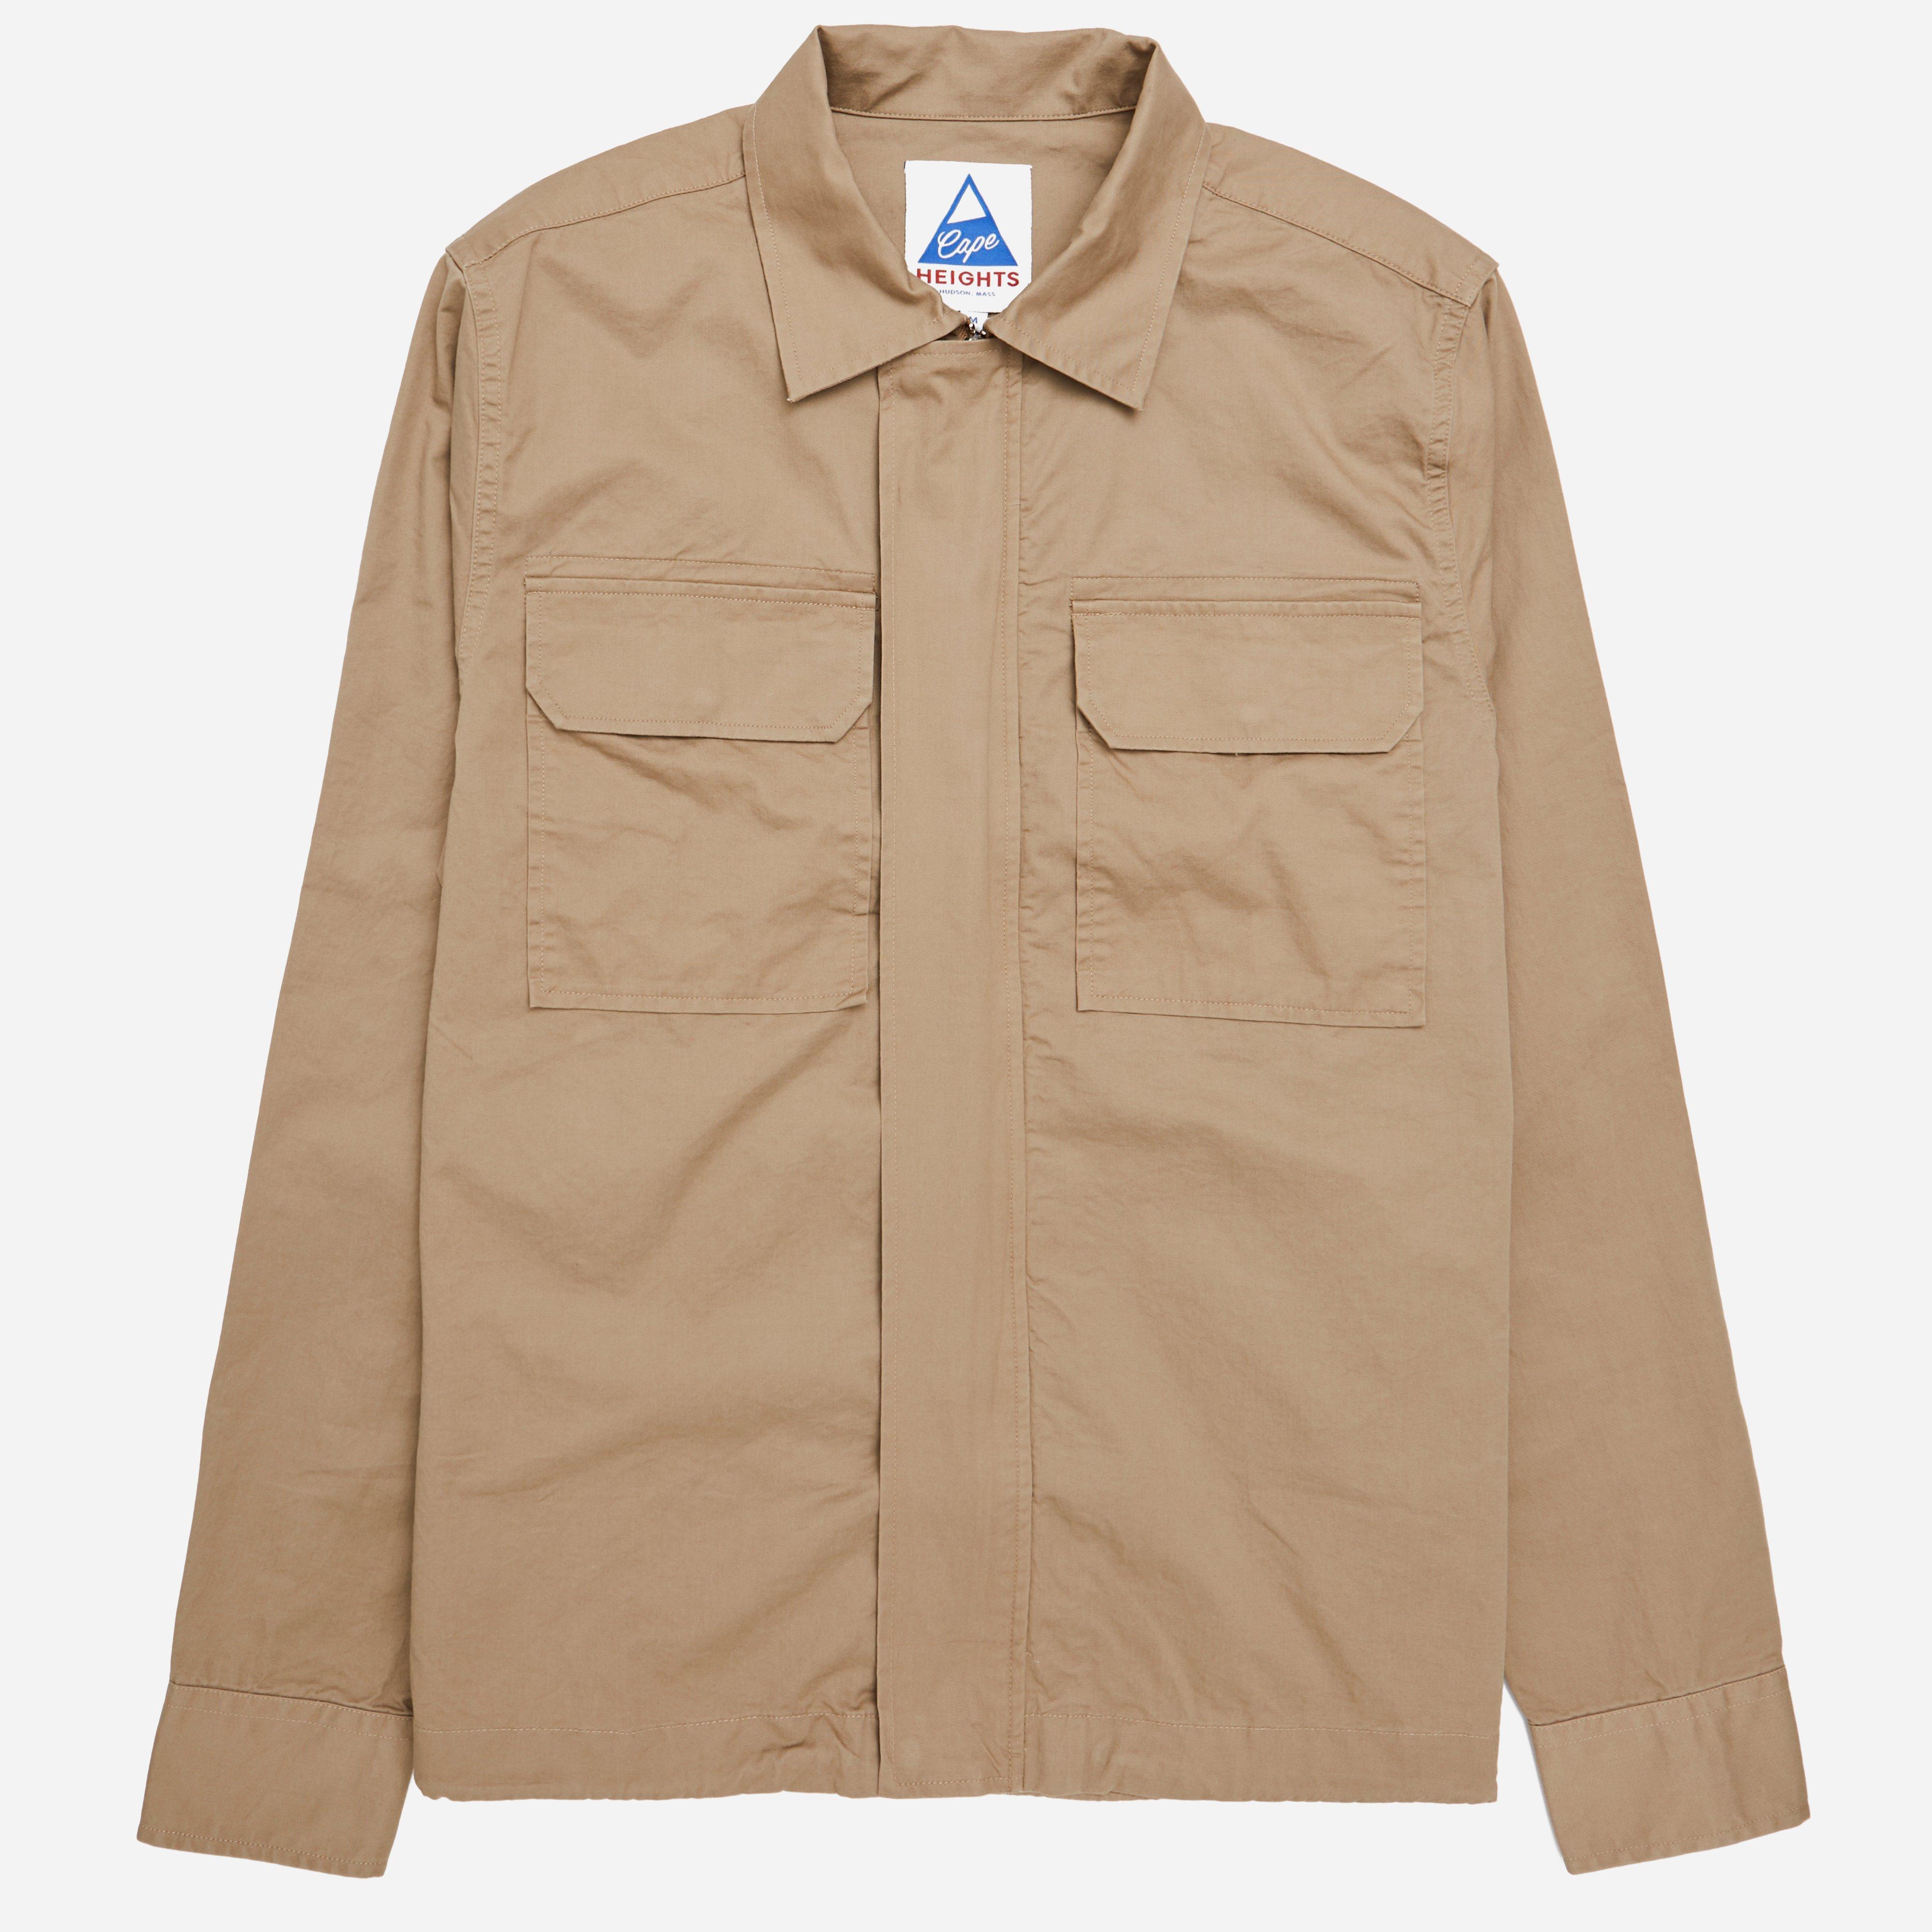 Cape Heights Coffman Shirt